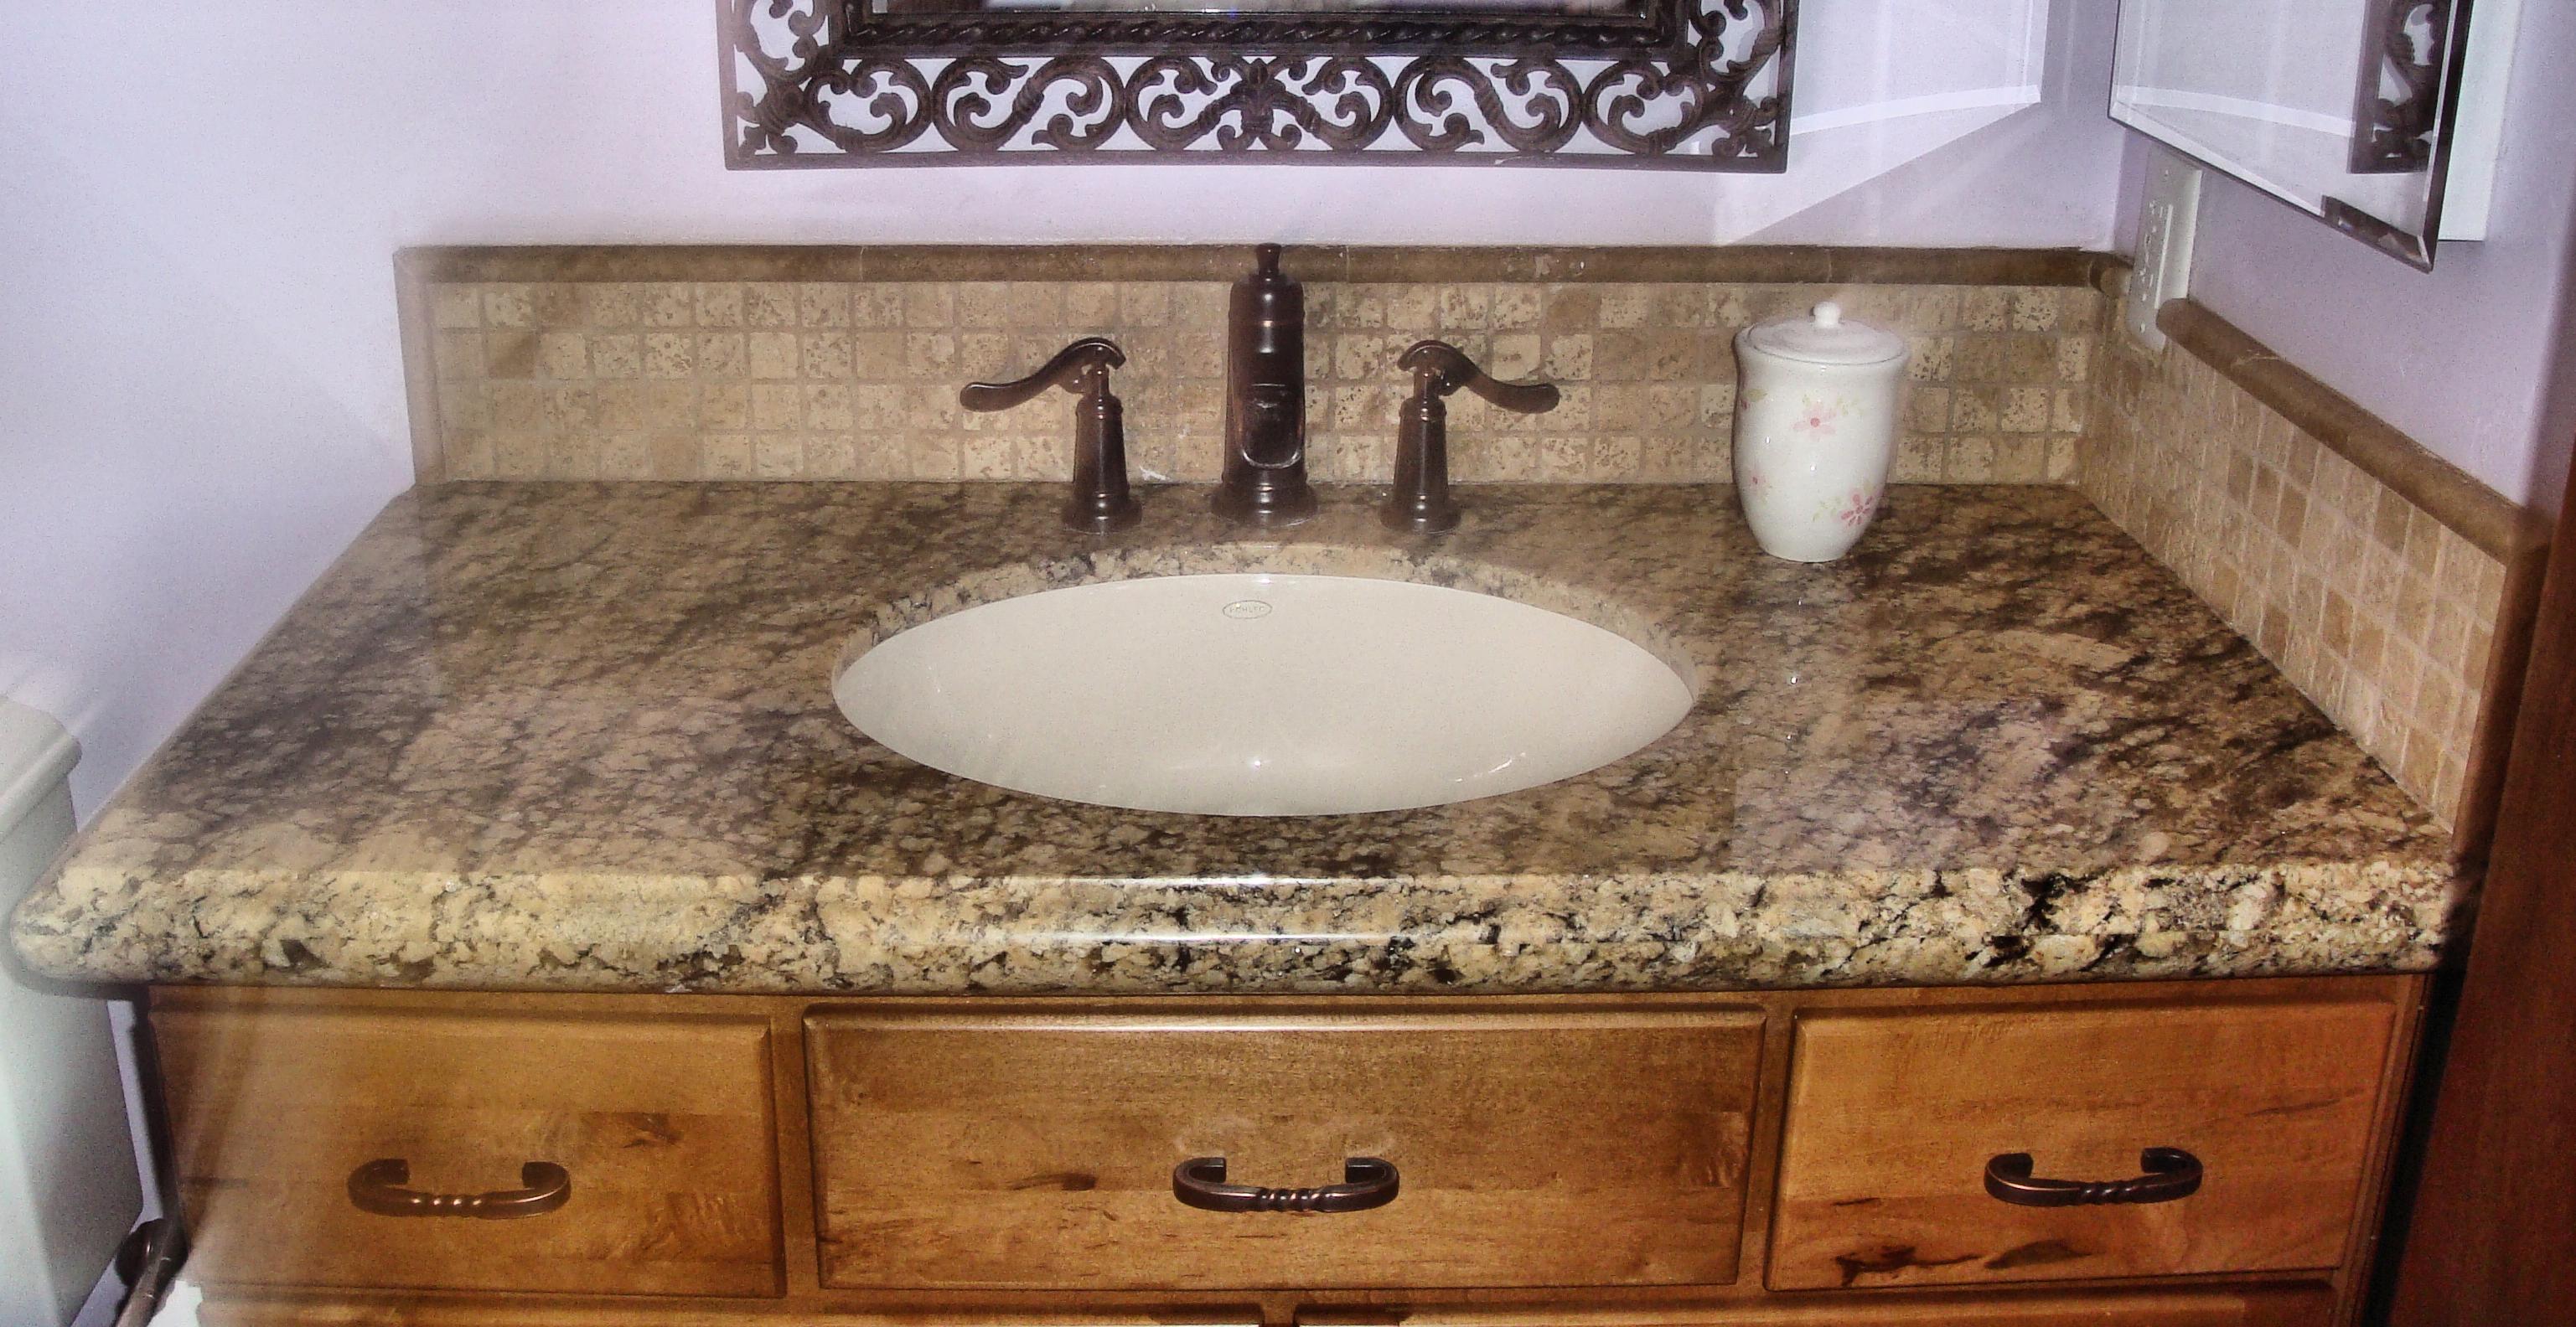 Granite Bathroom Tile 27 Cool Granite Bathroom Floor Tiles Ideas And Pictures